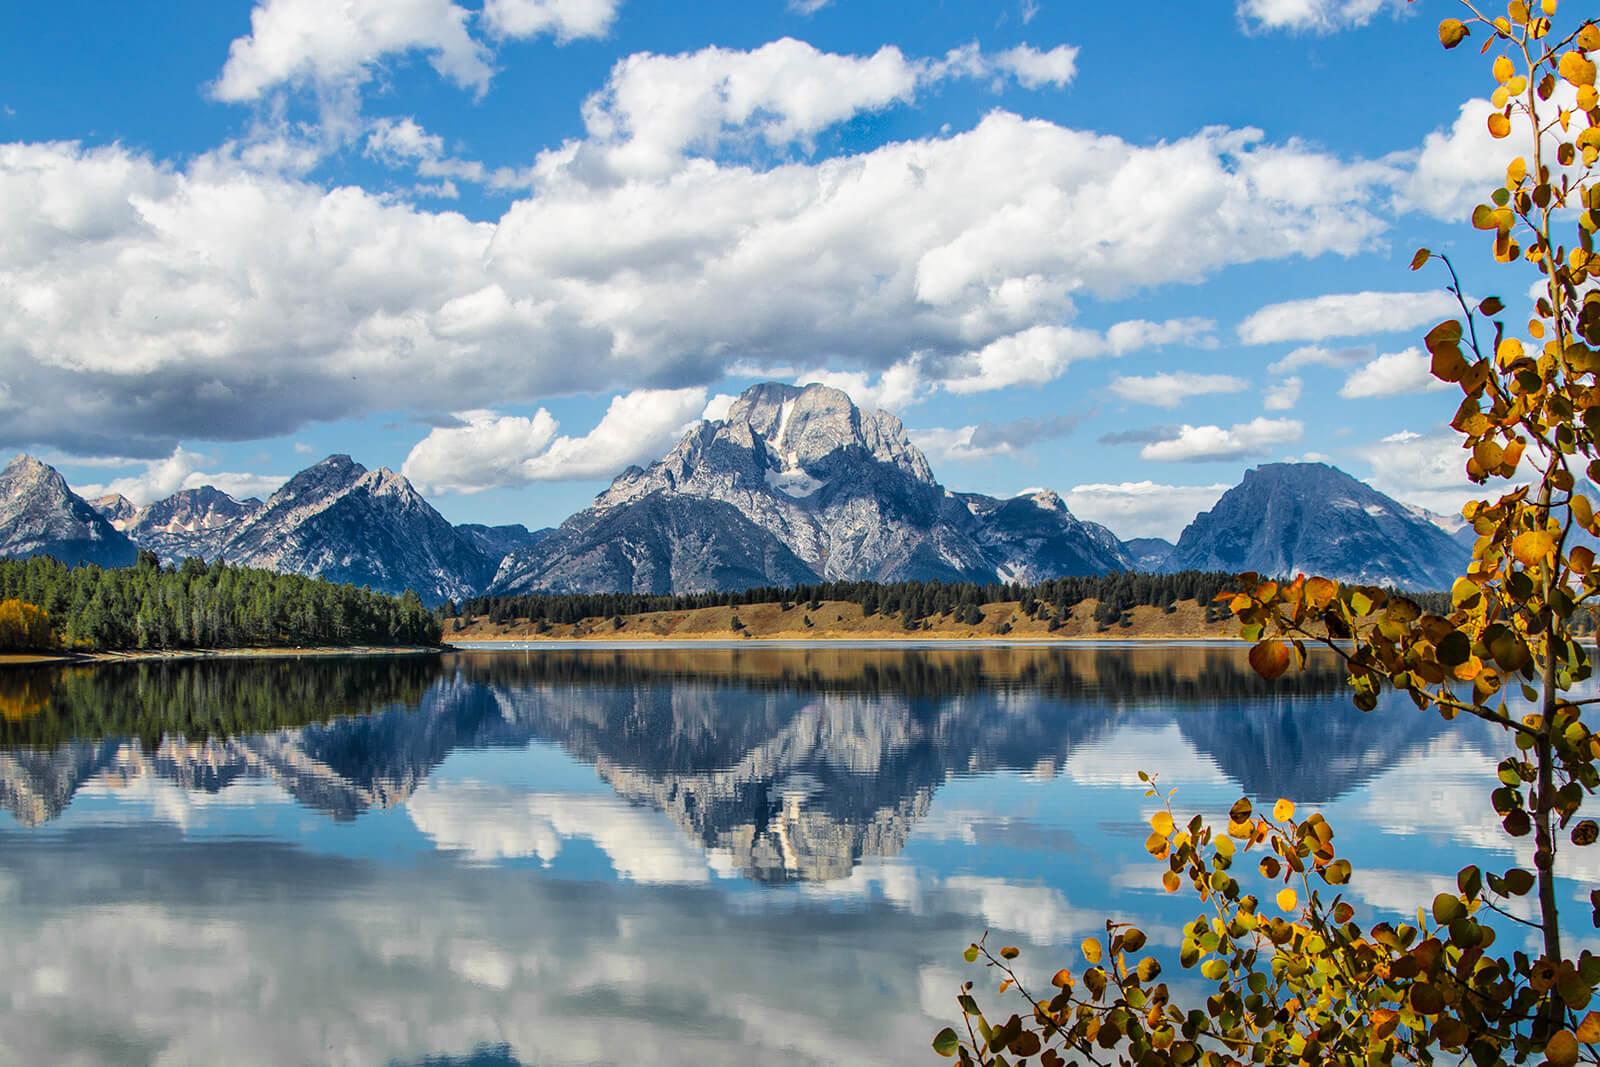 Breathtaking view of Jackson Hole, Wyoming